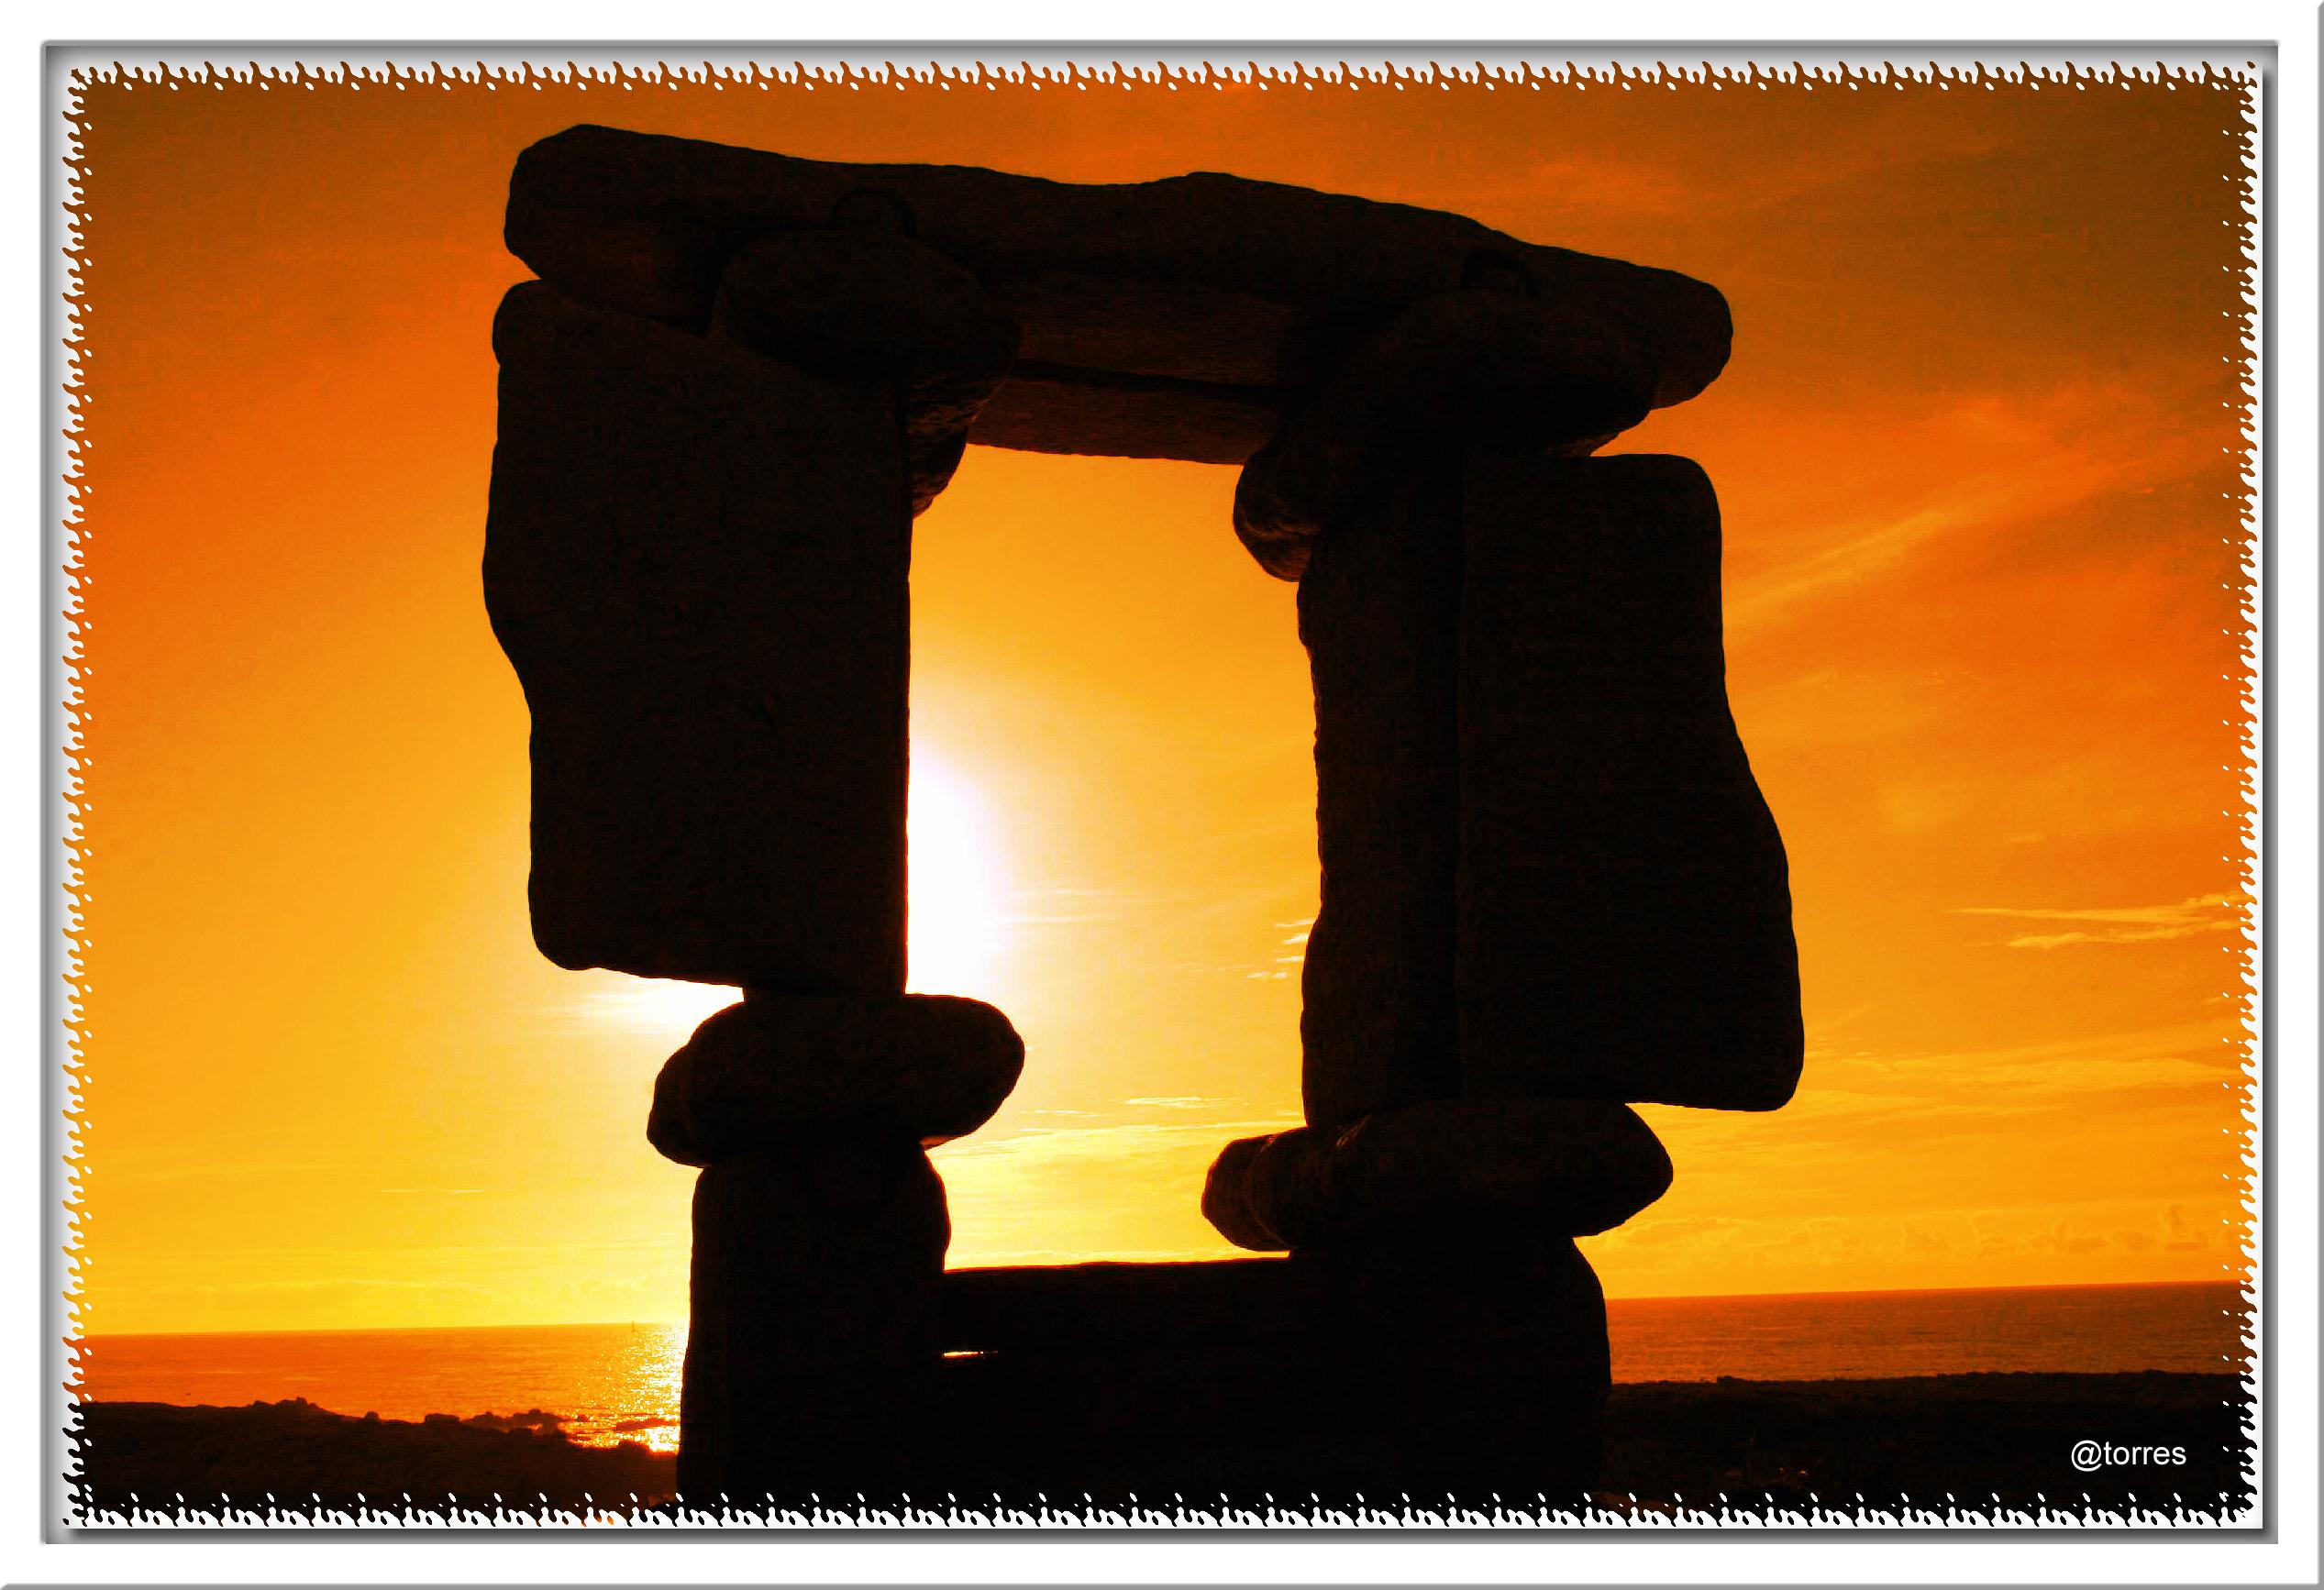 Foto playa Bens. Ventana al Mundo, escultura en granito, en el paseo marítimo de A Coruña (O portiño).